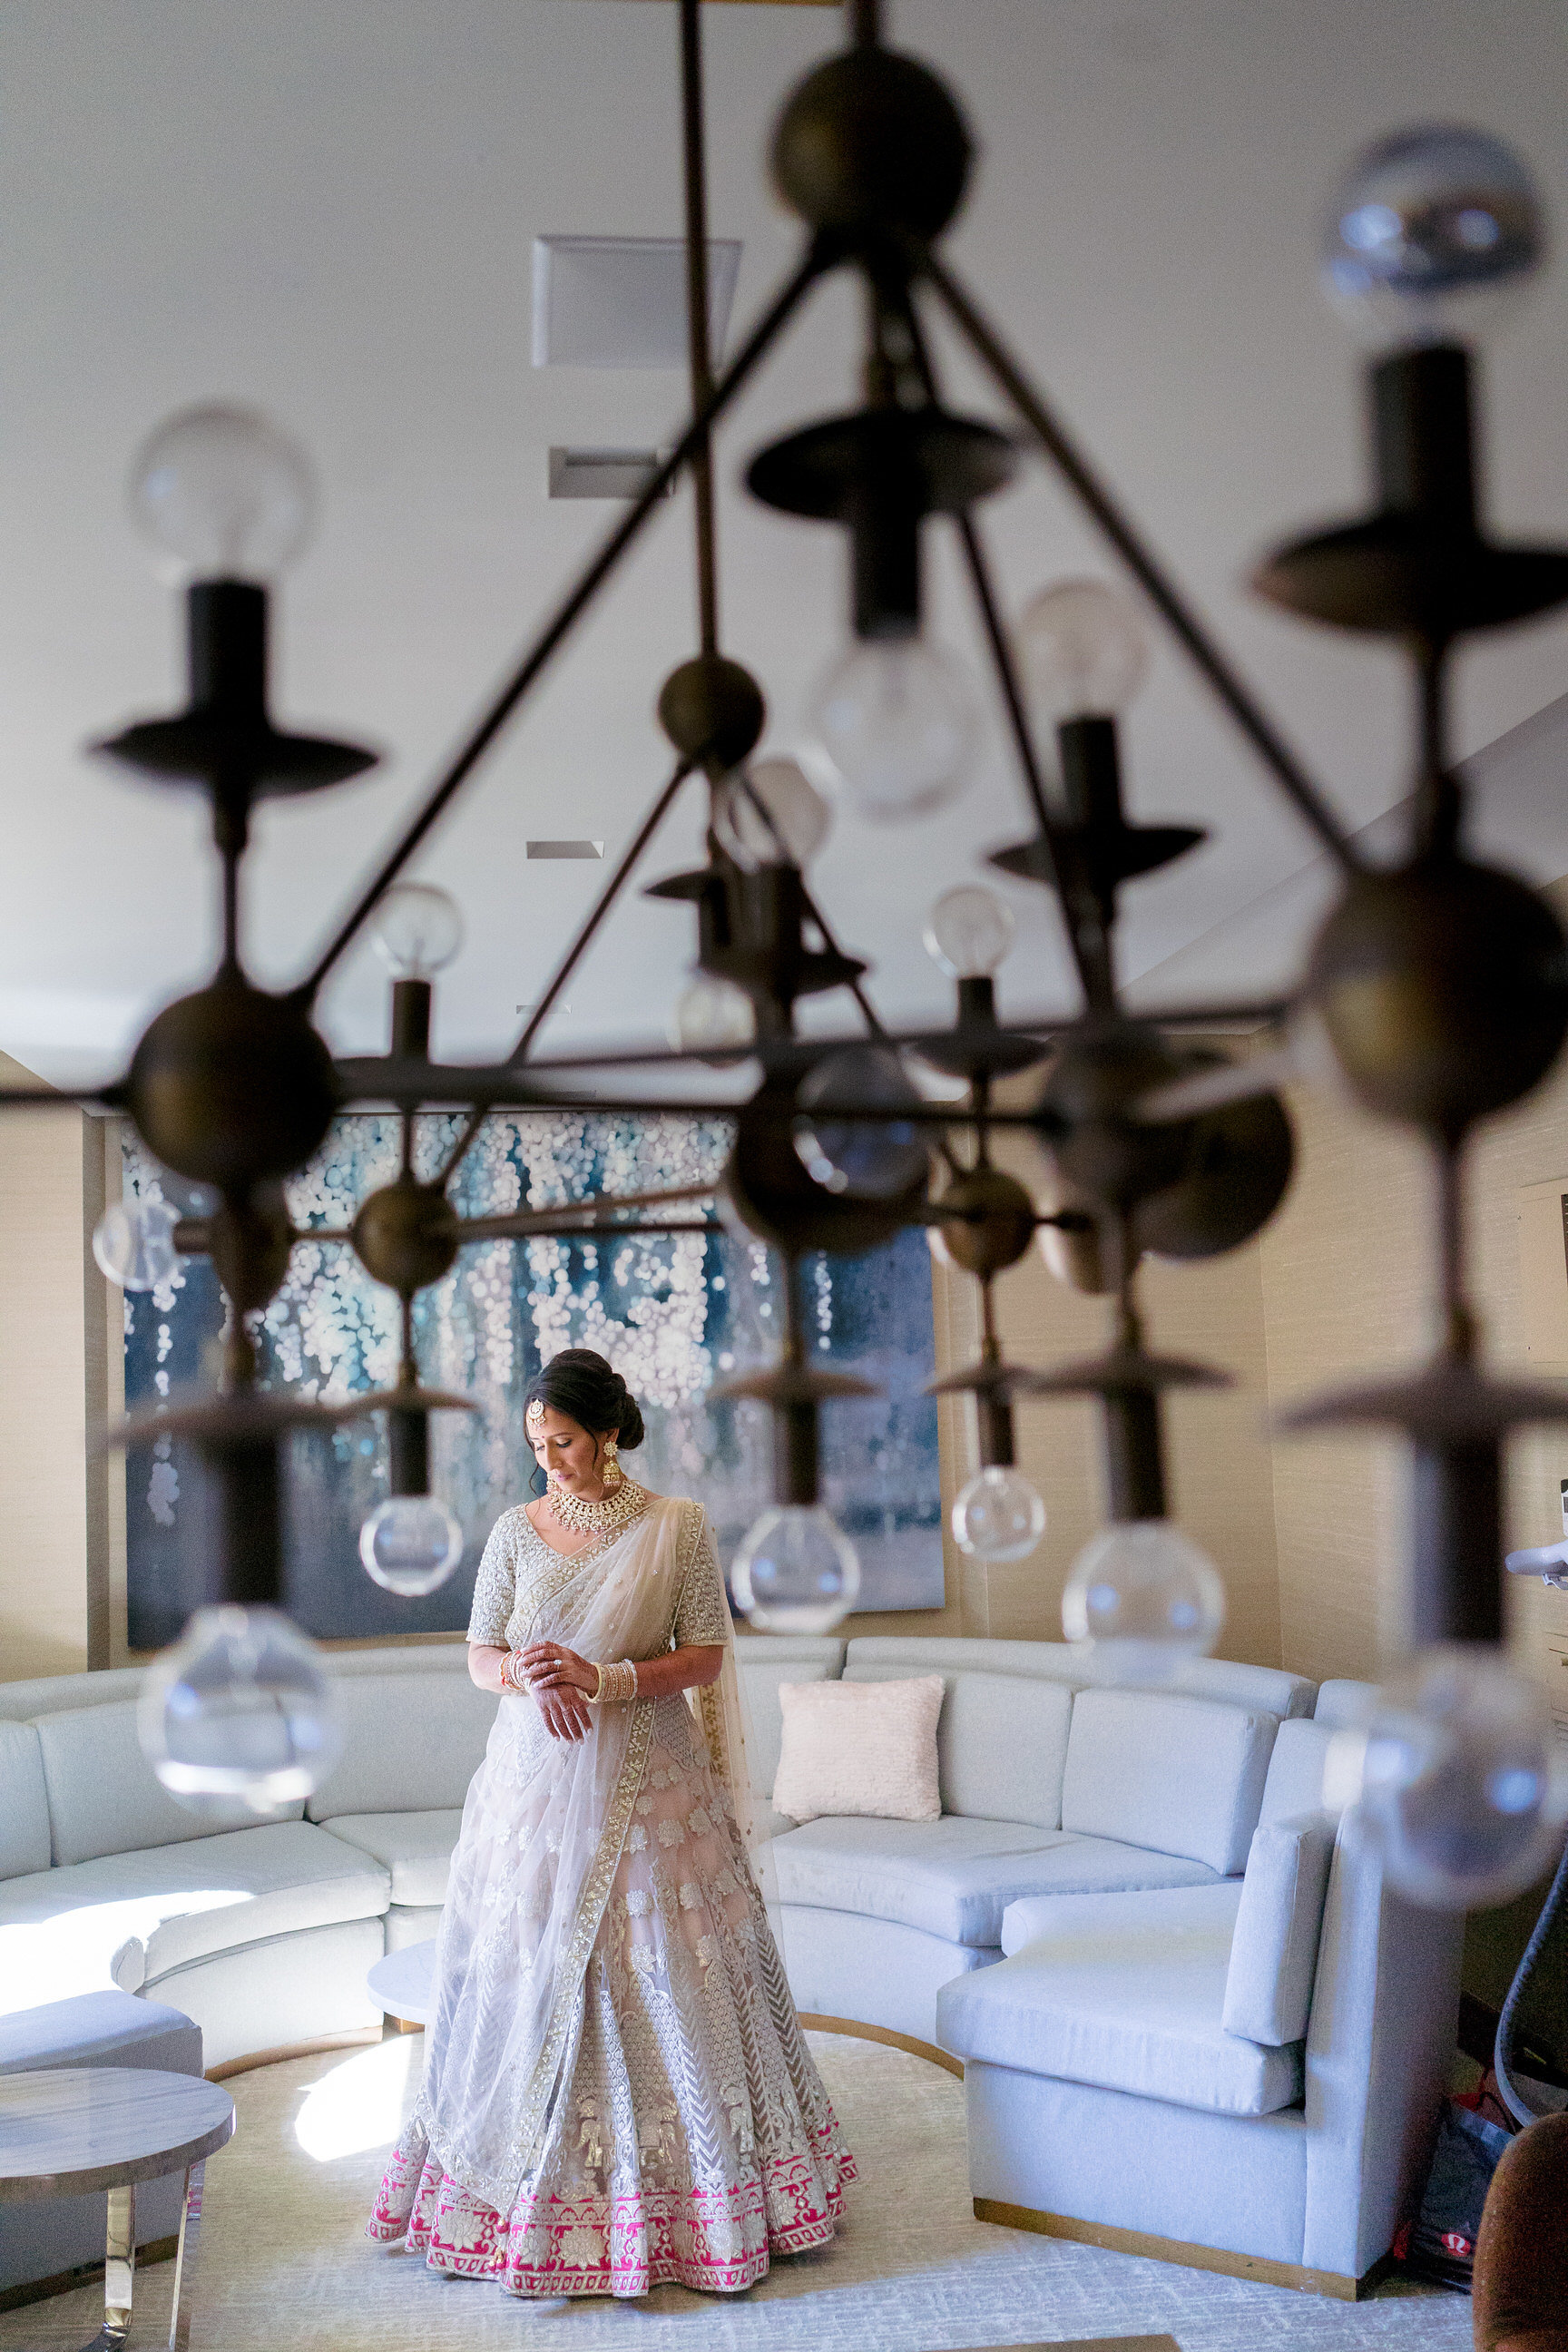 INDIAN WEDDING BRIDE IN WEDDING ATTIRE.JPG